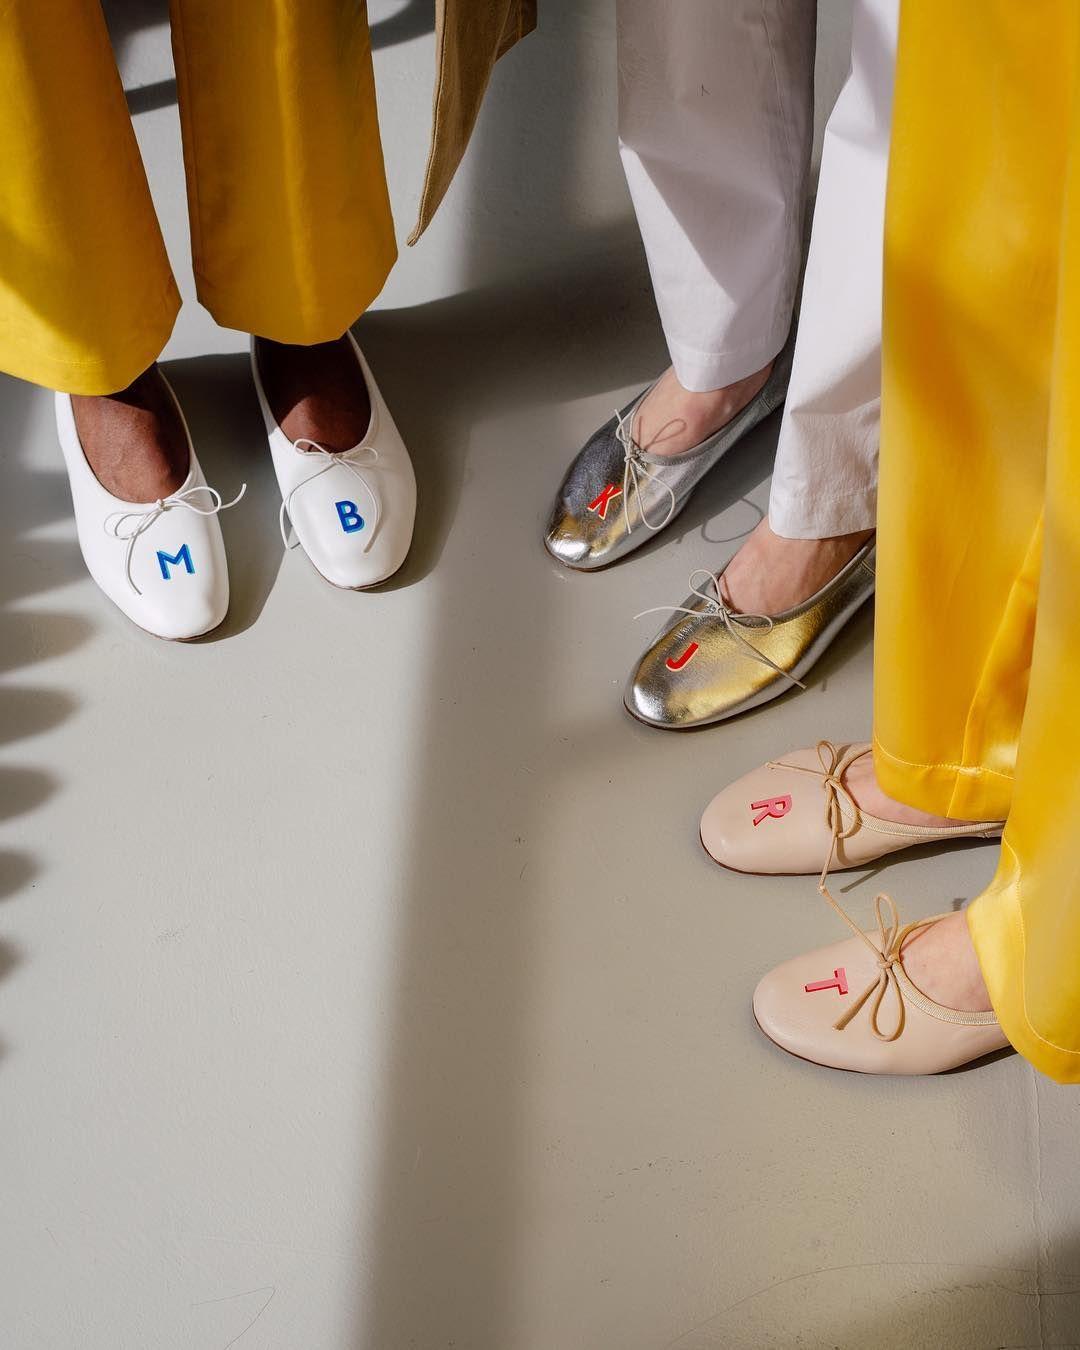 Ballerina flats, Ballerina shoes flats